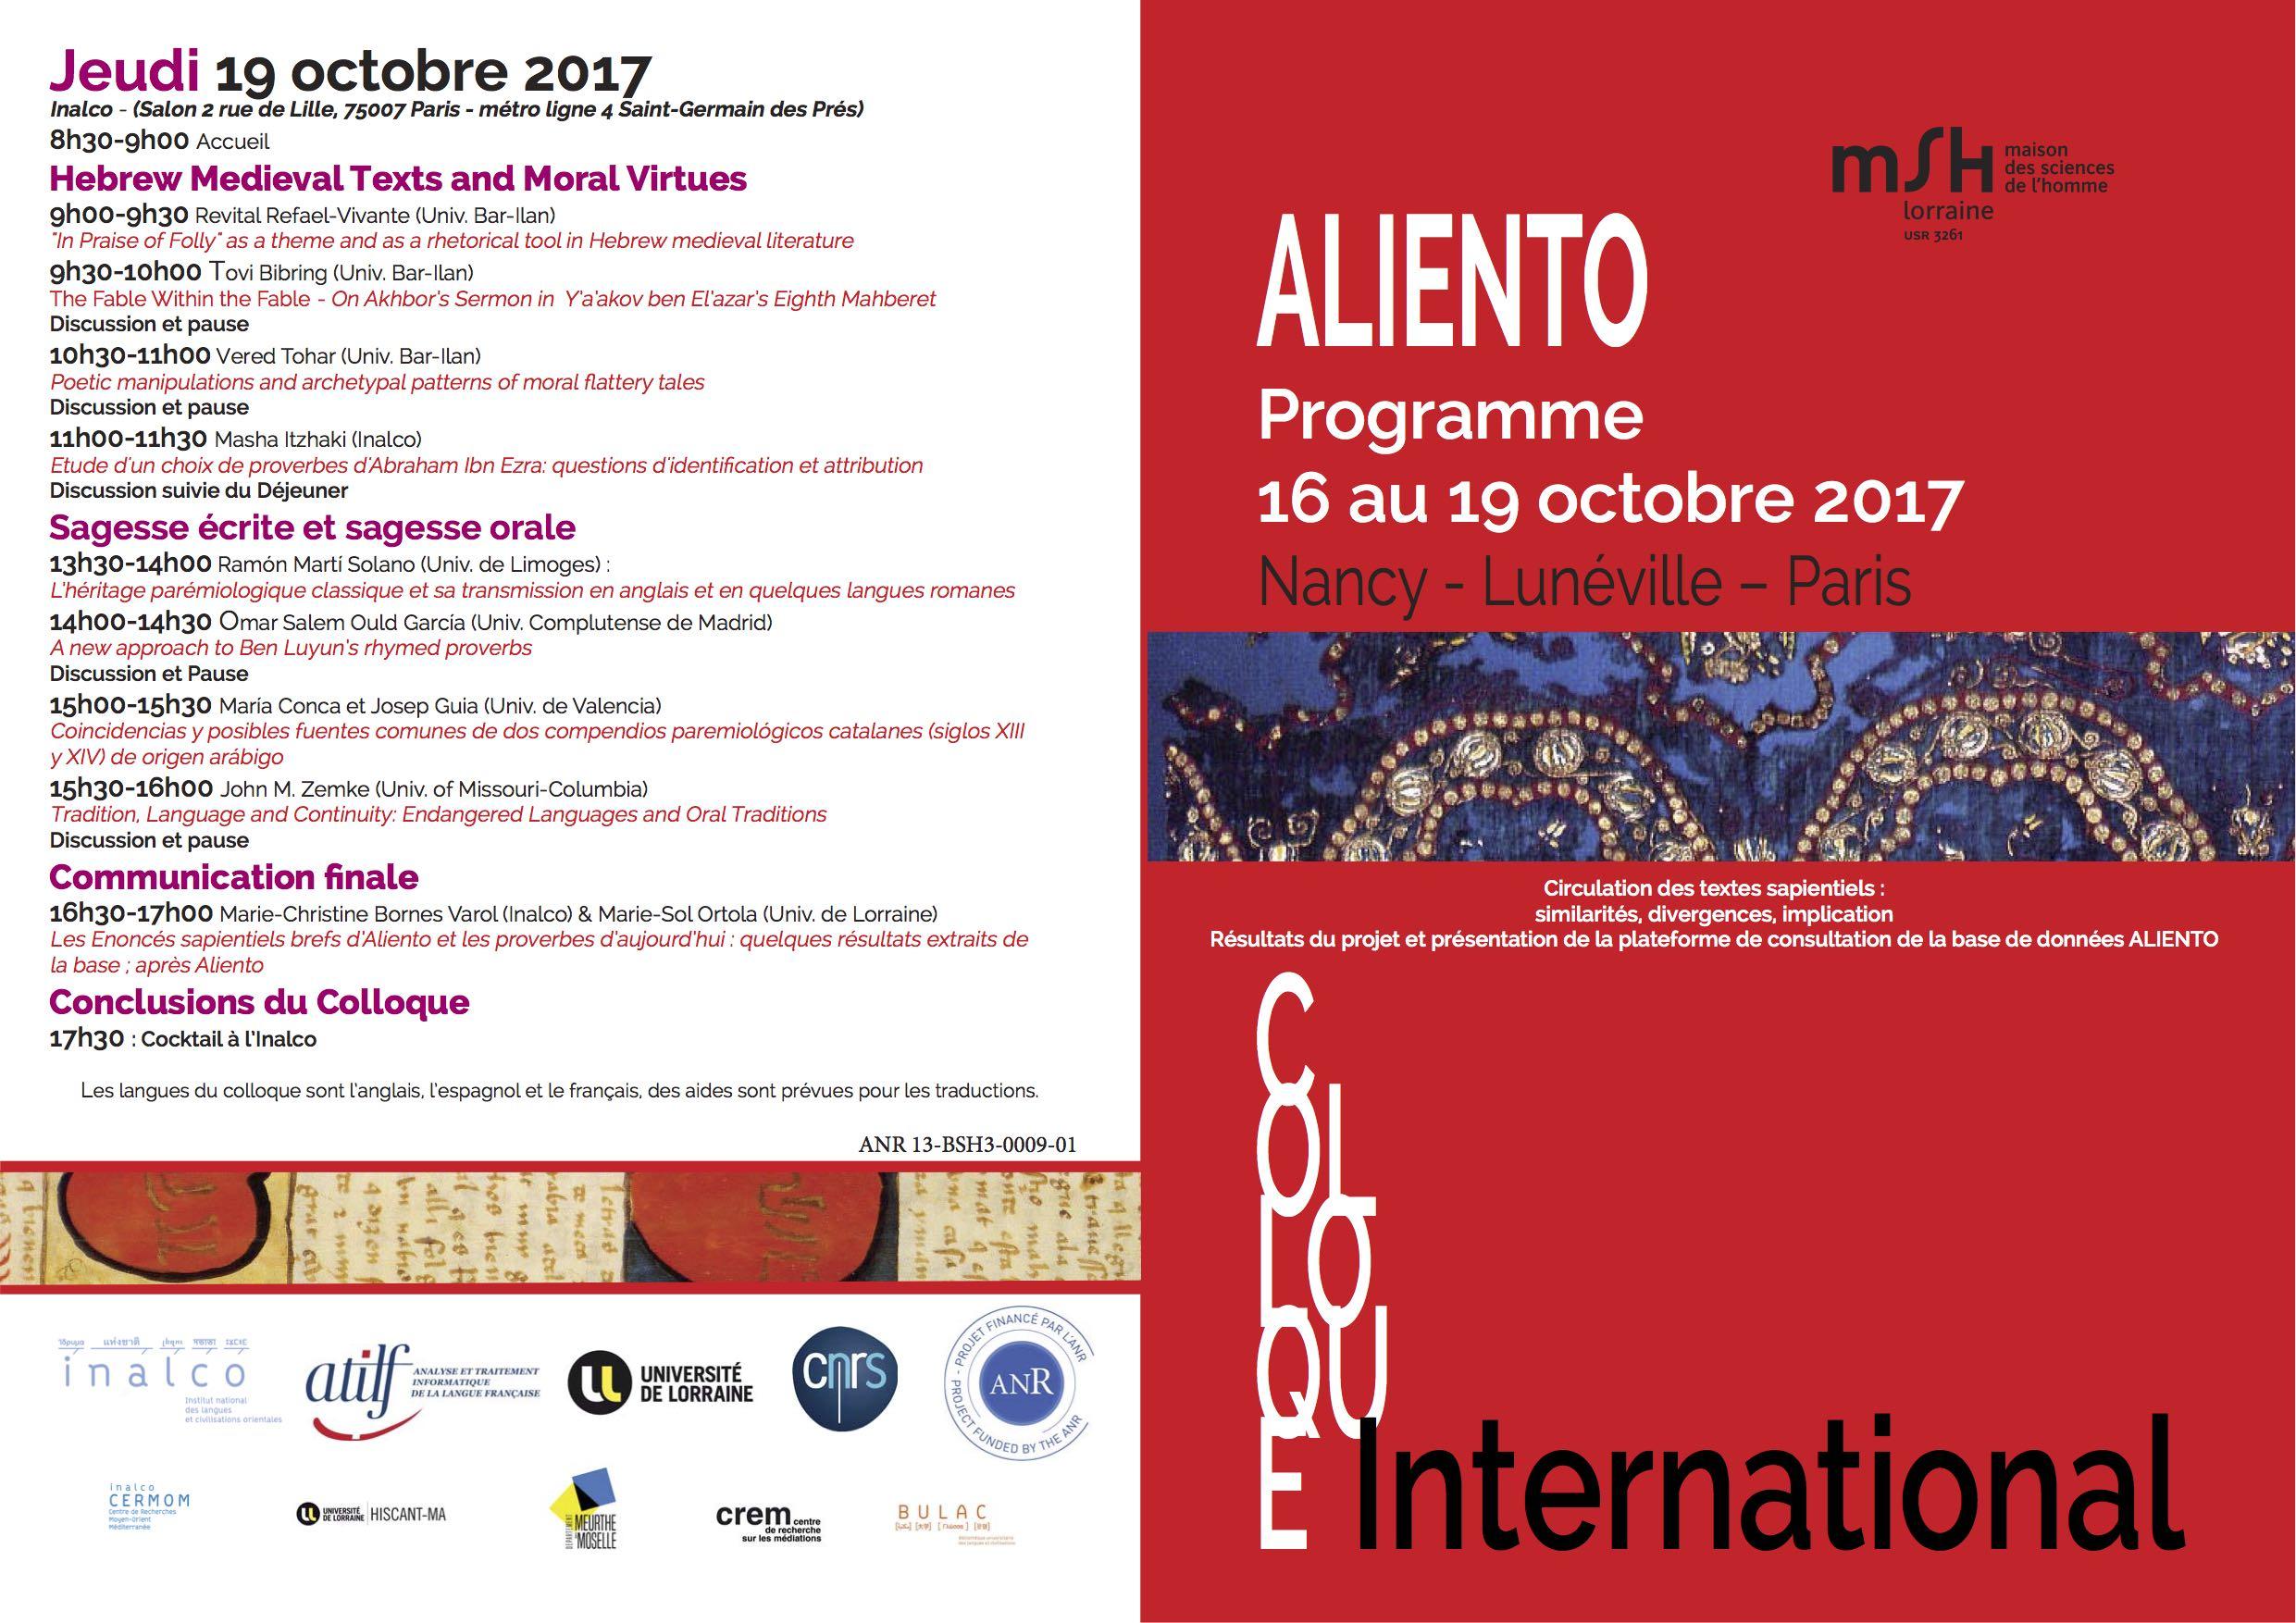 Programme ALIENTO OCT FRANCAIS version 26 sept 2